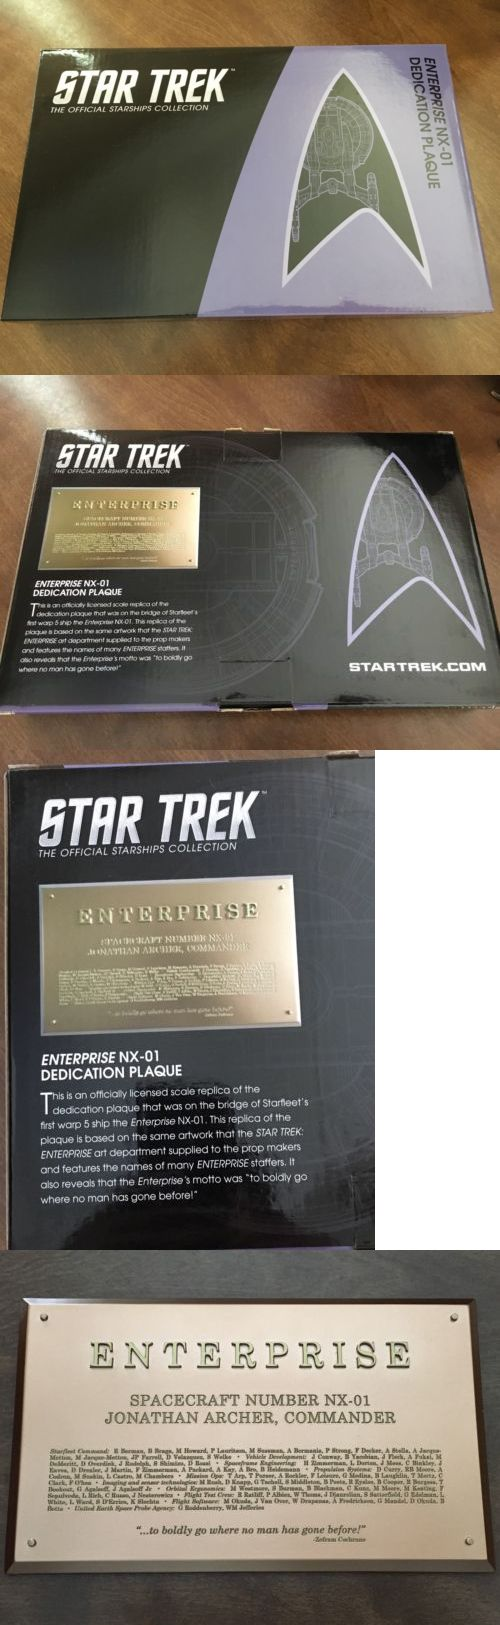 Star Trek 49211: Eaglemoss Star Trek Uss Enterprise Nx-01 Dedication Plaque - New -> BUY IT NOW ONLY: $34.99 on eBay!